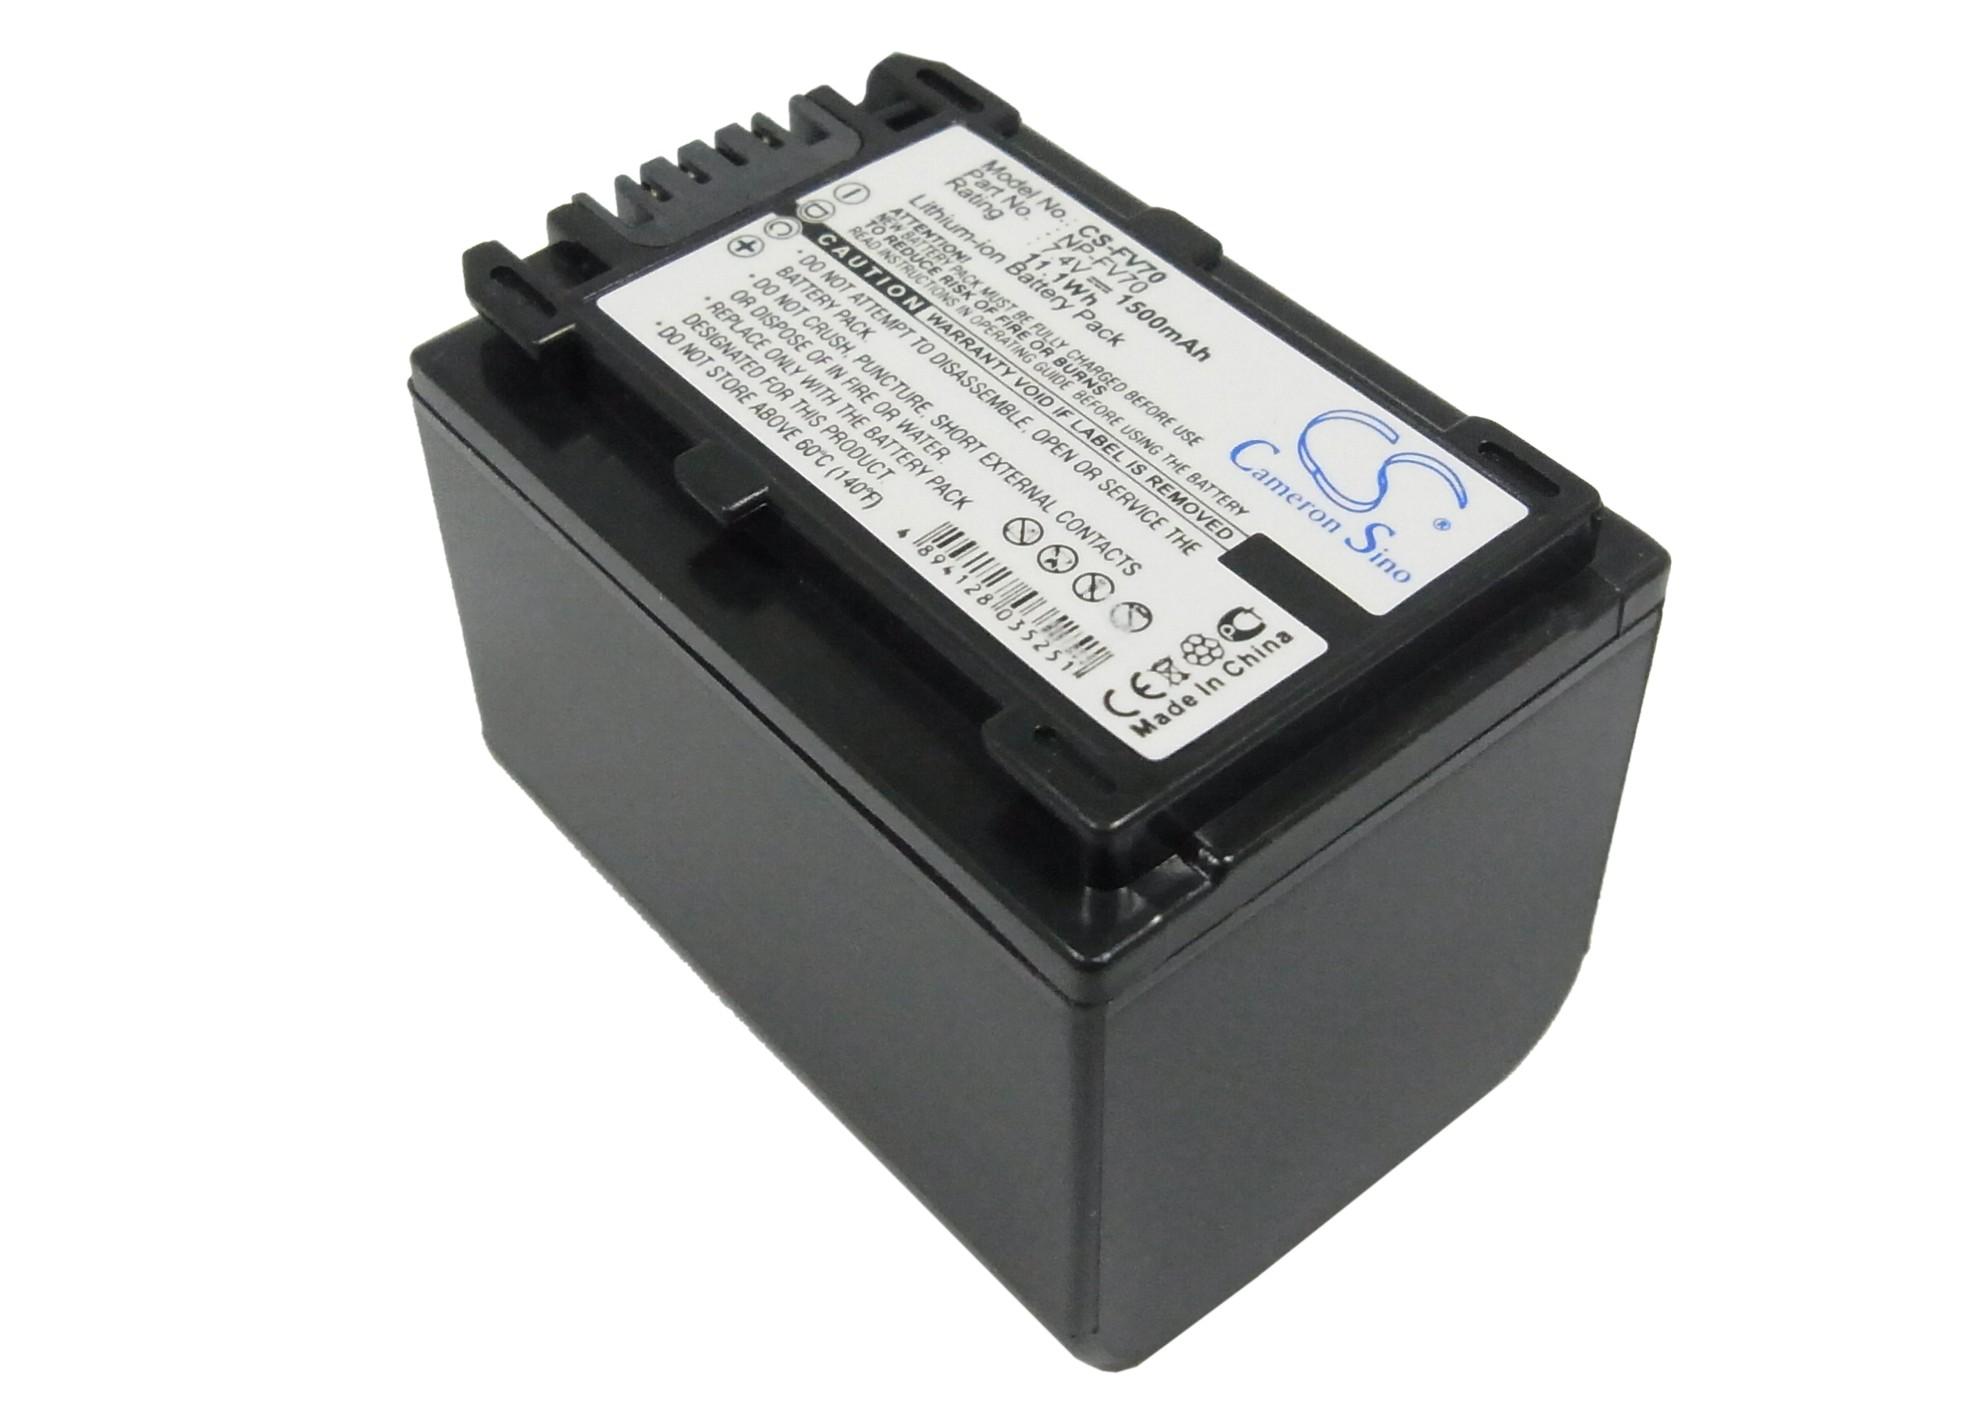 Cameron Sino baterie do kamer a fotoaparátů pro SONY DCR-DVD203E 7.4V Li-ion 1500mAh černá - neoriginální